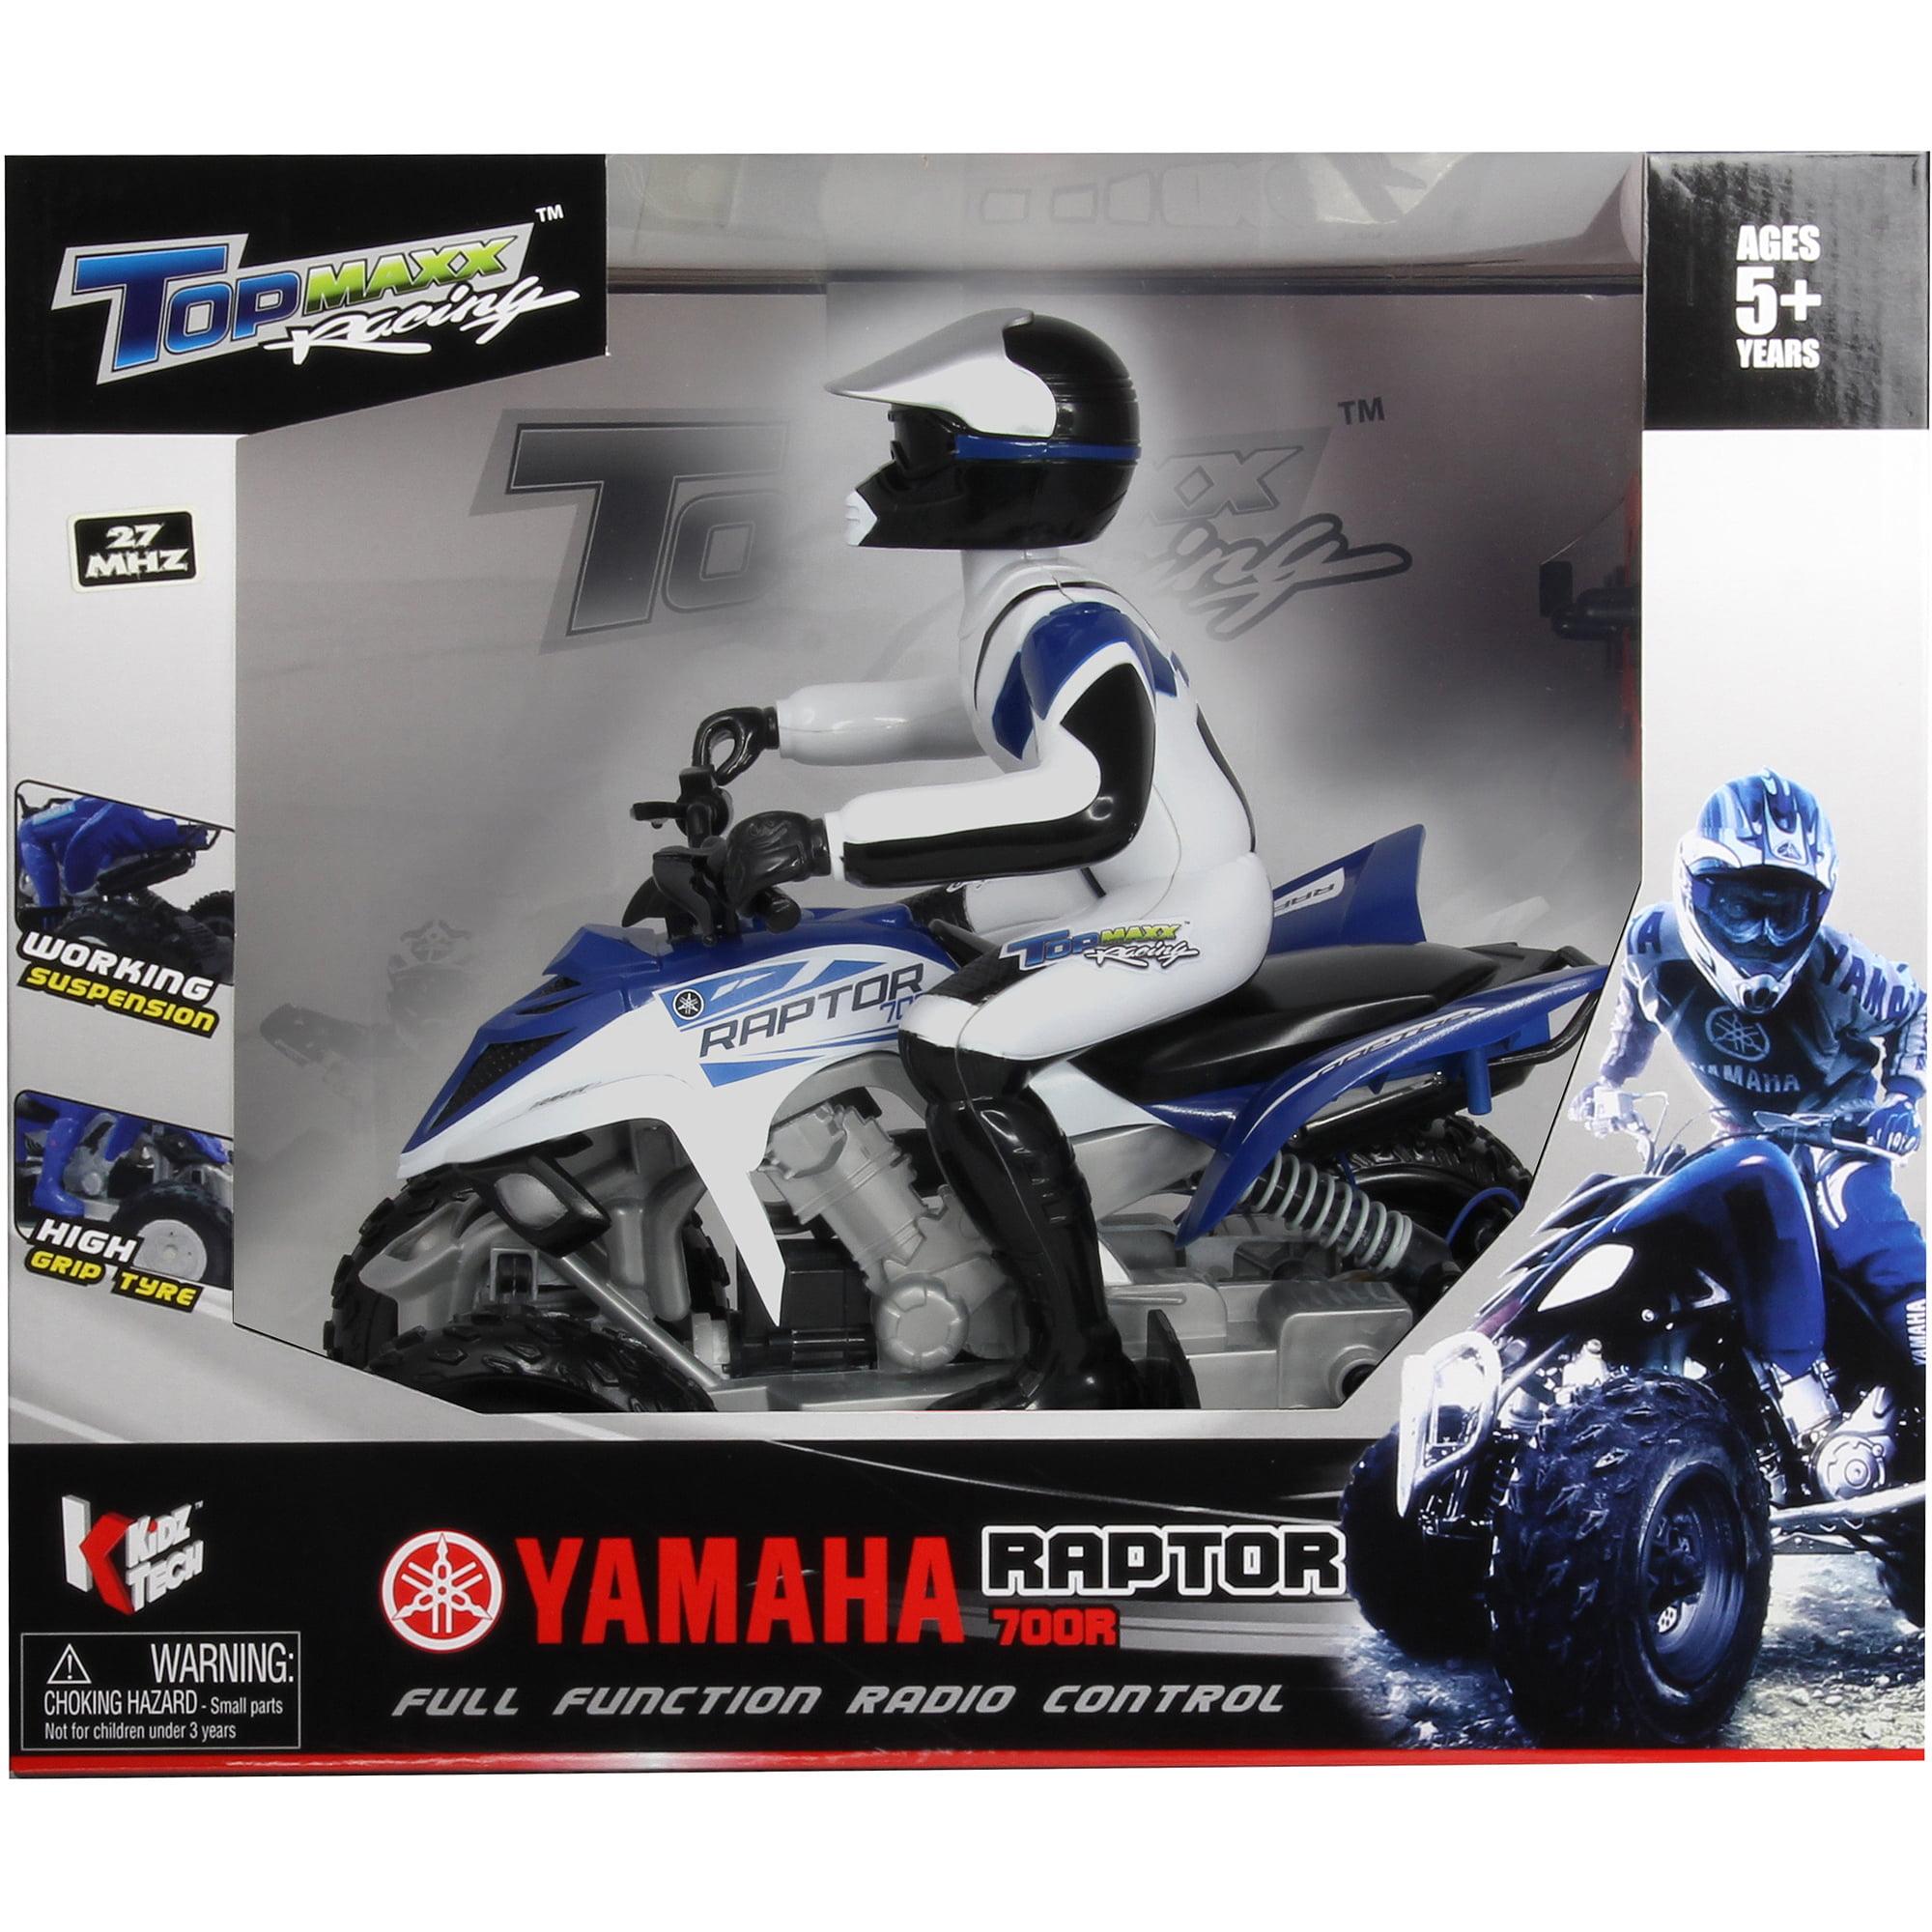 1:6 Scale RC Yamaha Raptor 700R